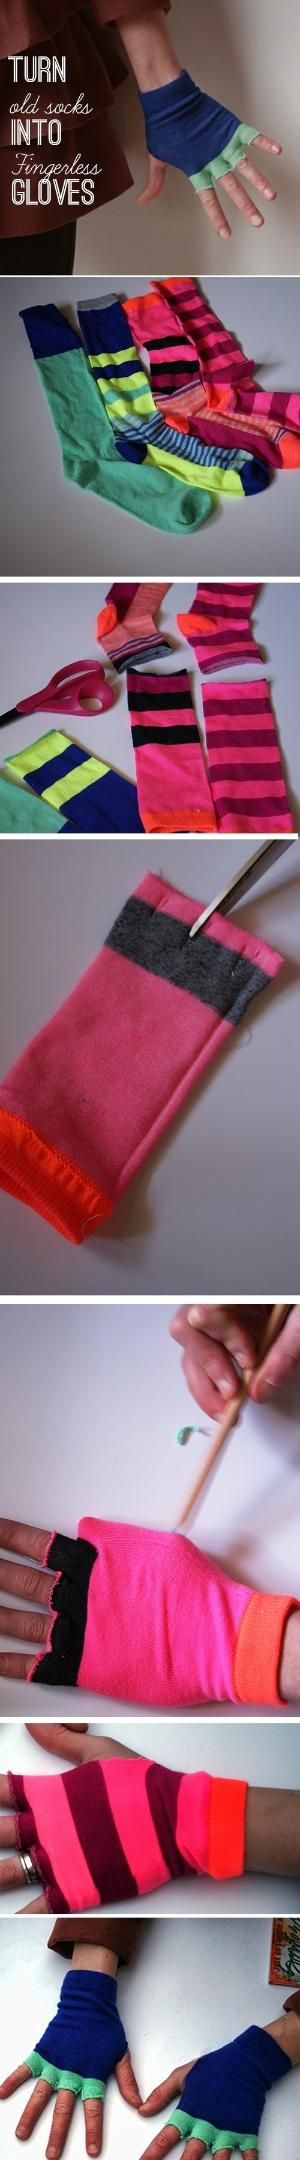 DIY gloves from old socks #DIY #crafts by Krista.S